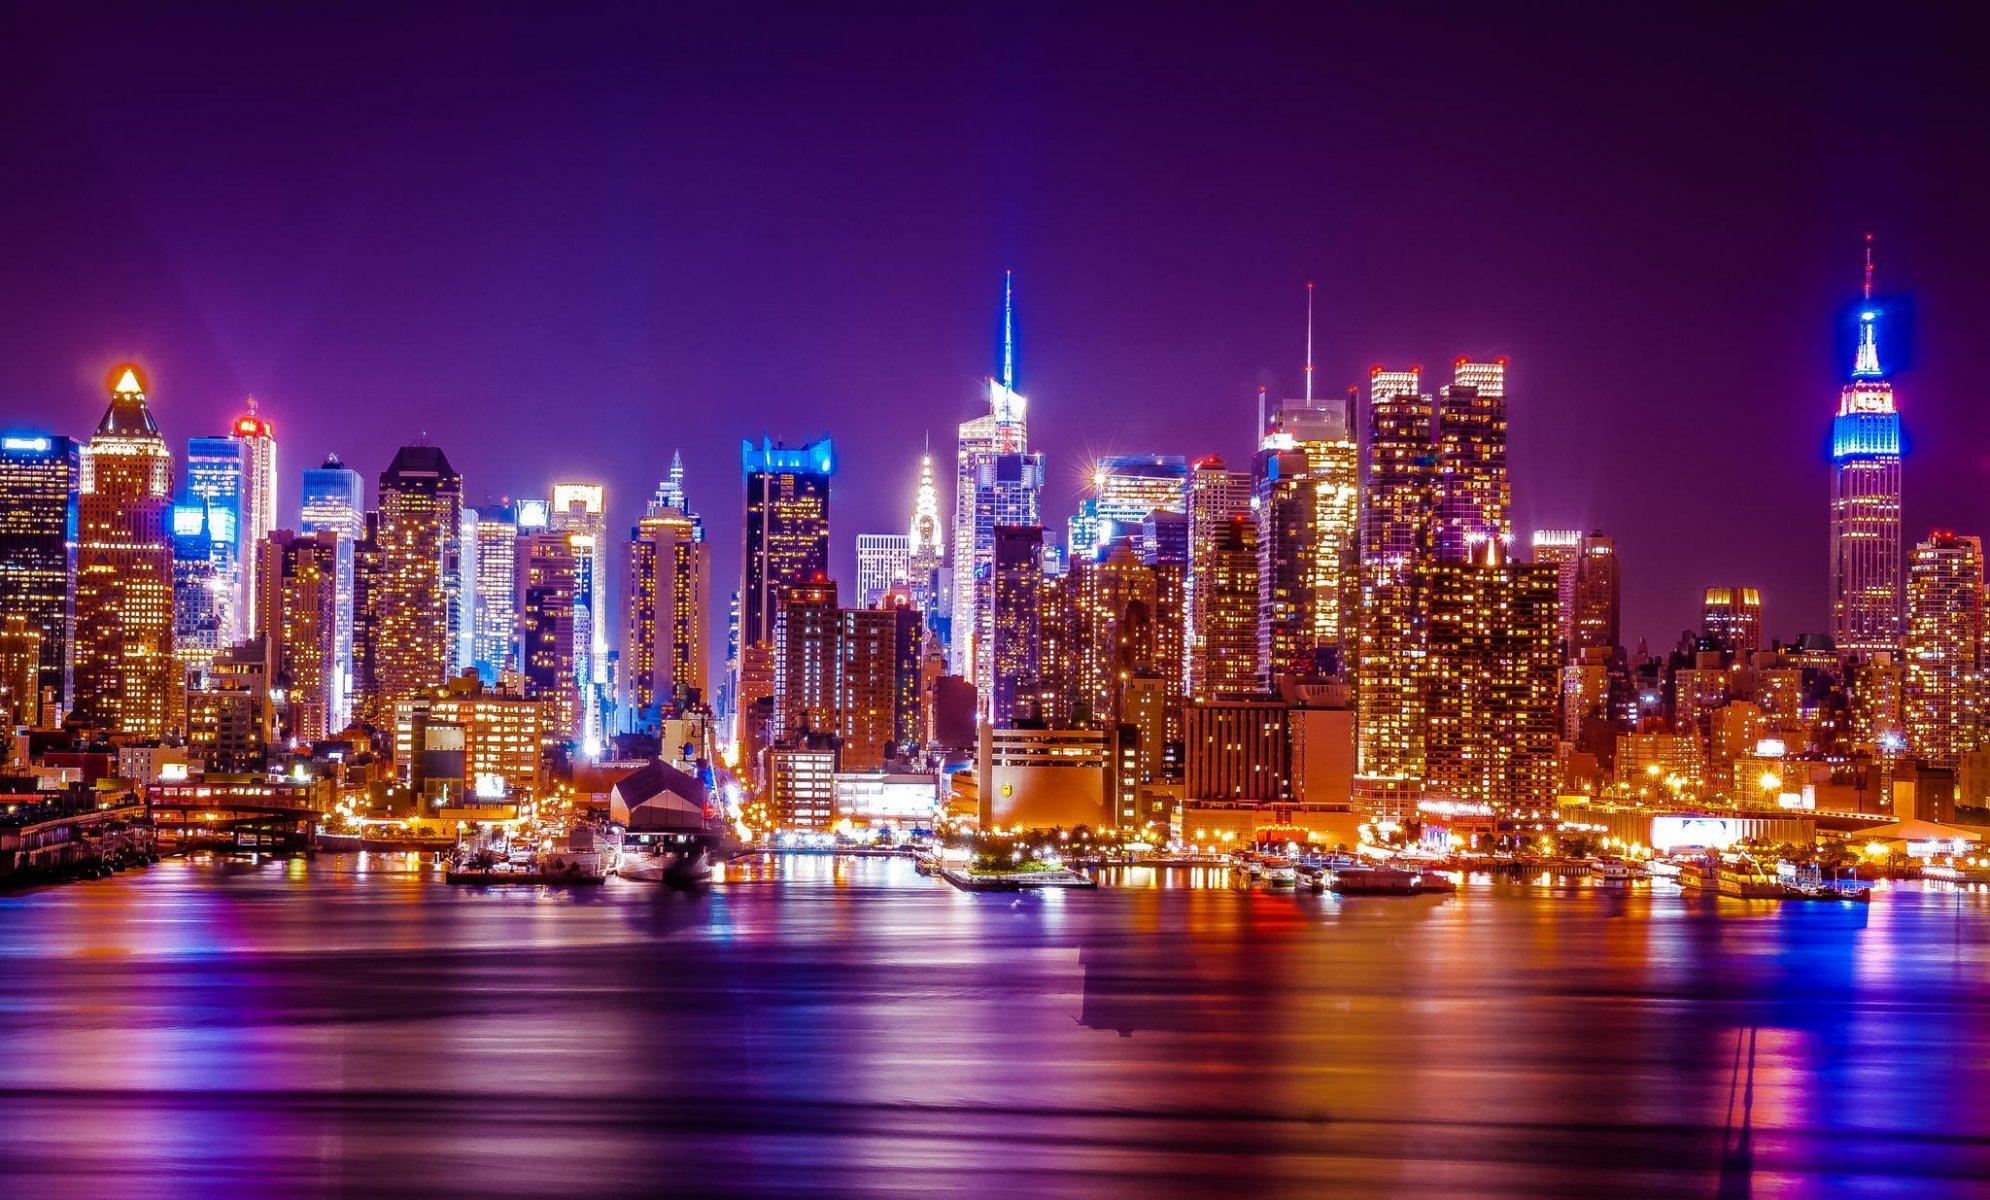 Hudson river ny new york city wtc city skyline skyline night town panorama skyscraper lights